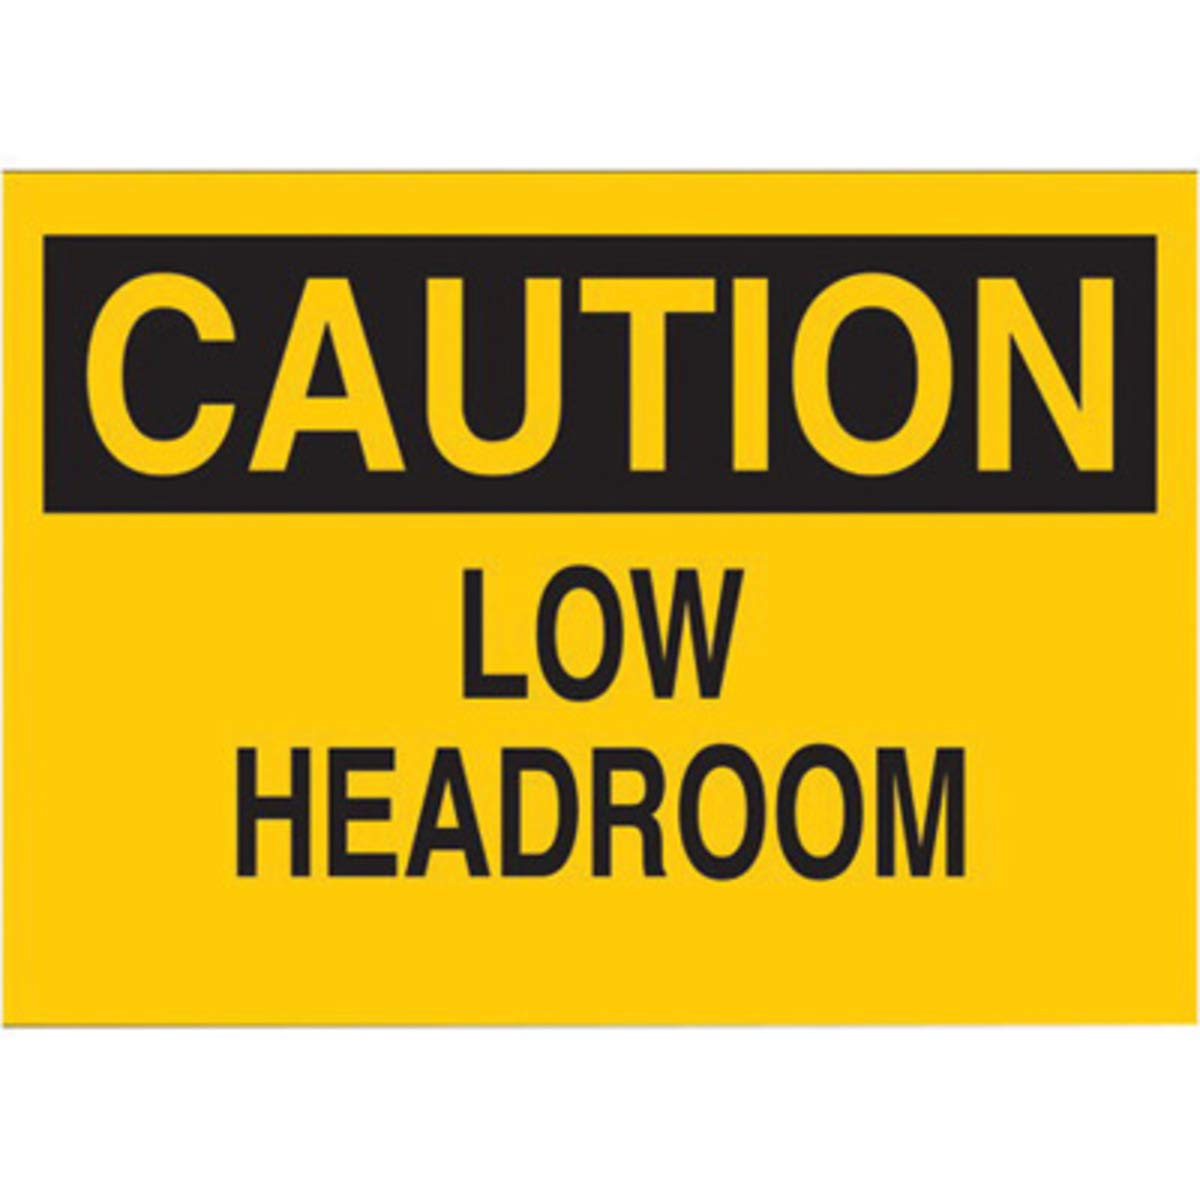 Brady 10'' X 14'' X 1/10'' Black On Yellow .0984'' B-120 Fiberglass Machine And Operational Sign''CAUTION LOW HEADROOM''